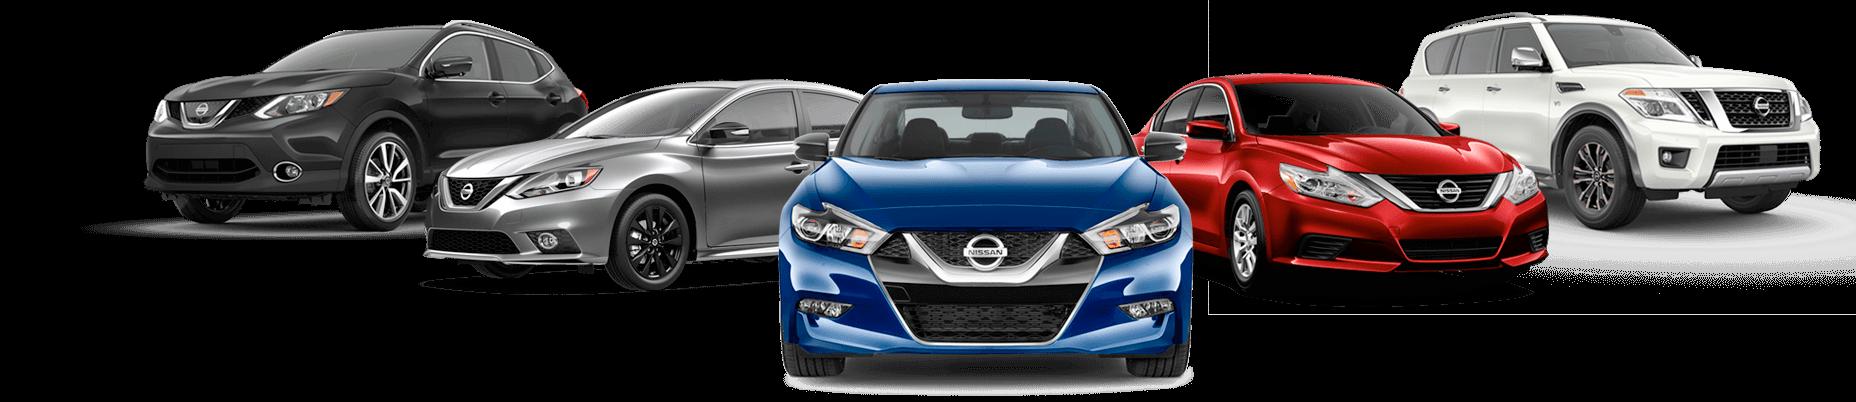 Nissan certified collision repair car line up